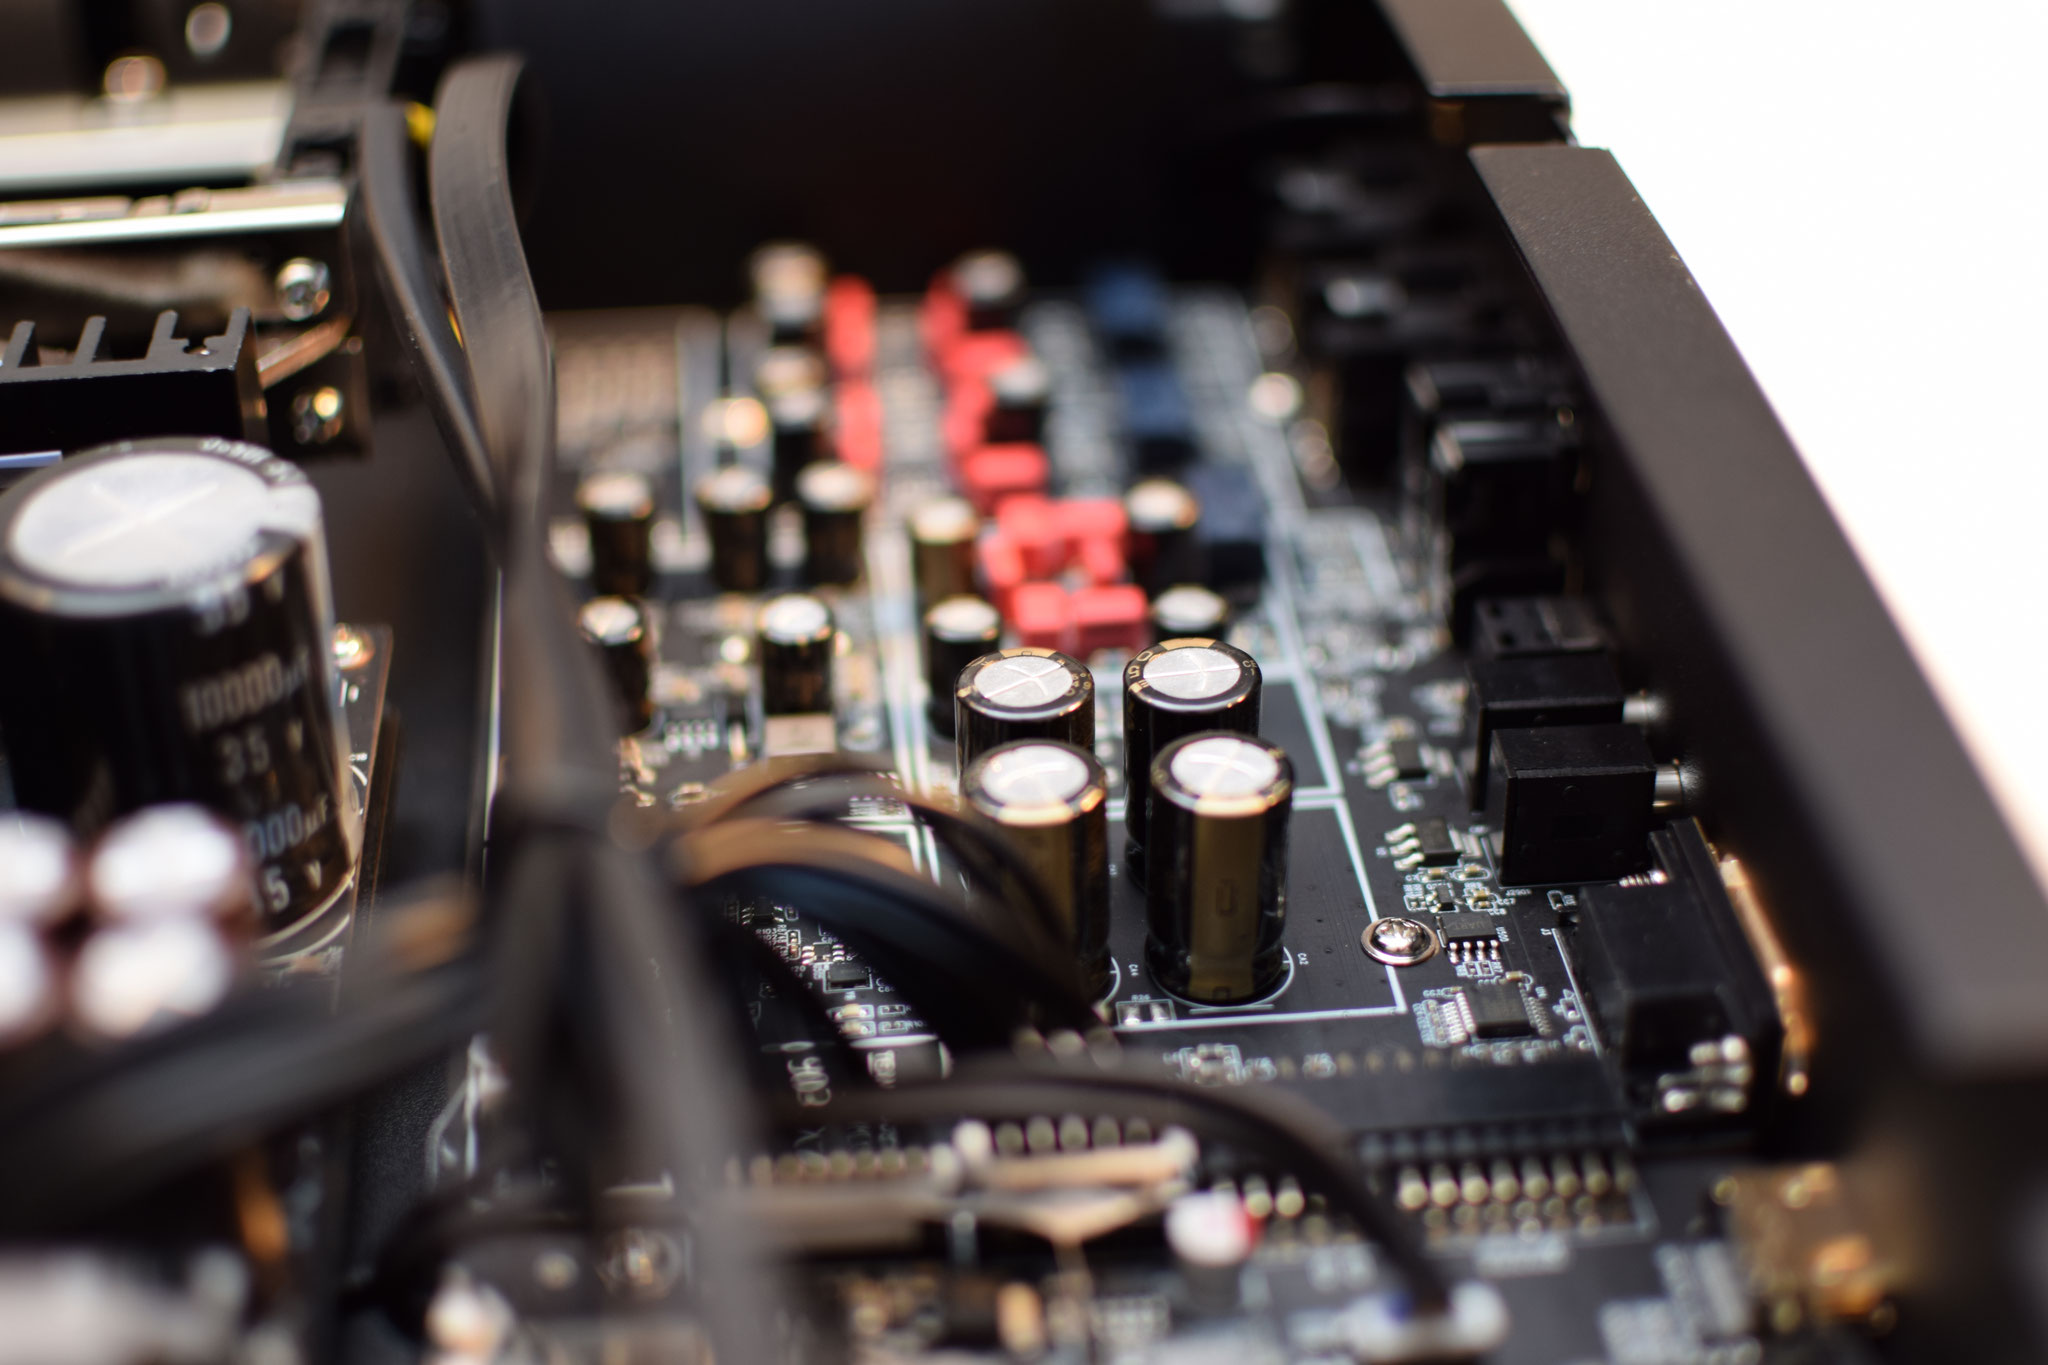 Zidoo UHD2000 Audio DAC Board